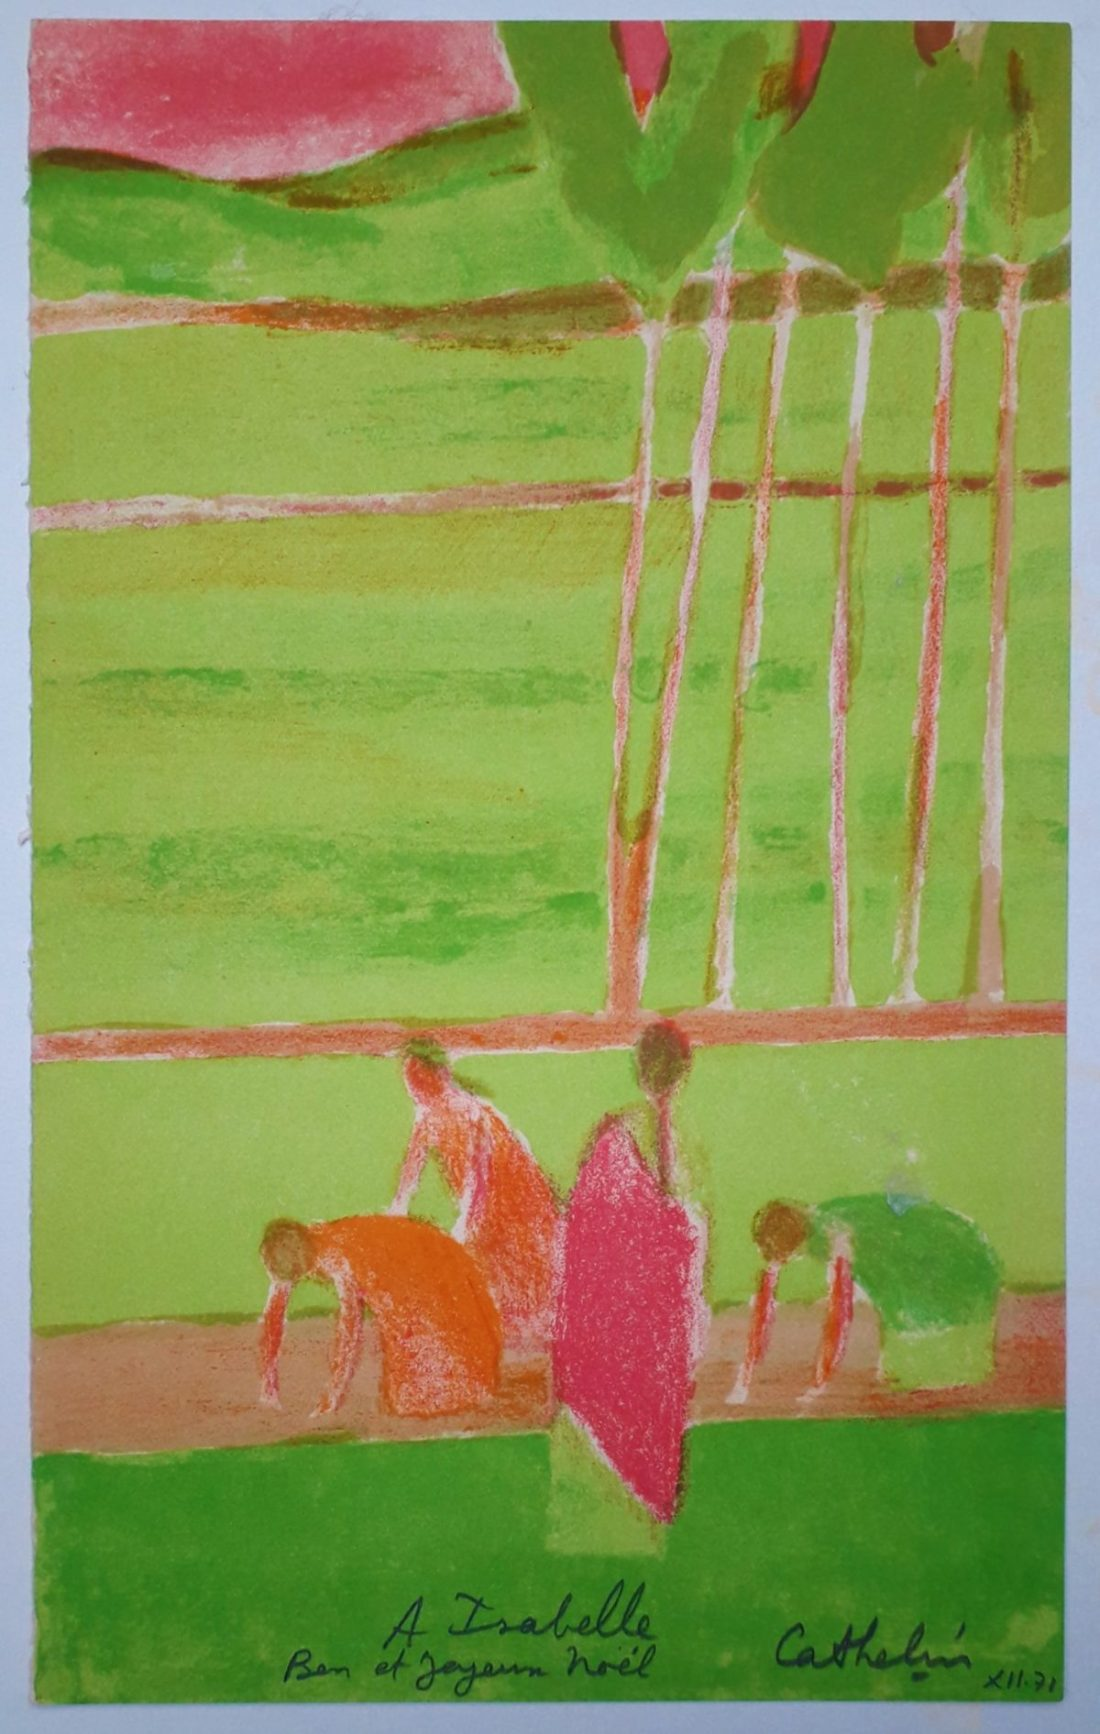 cathelin-bernard-riziere-a-ceylan-1971-lithographie